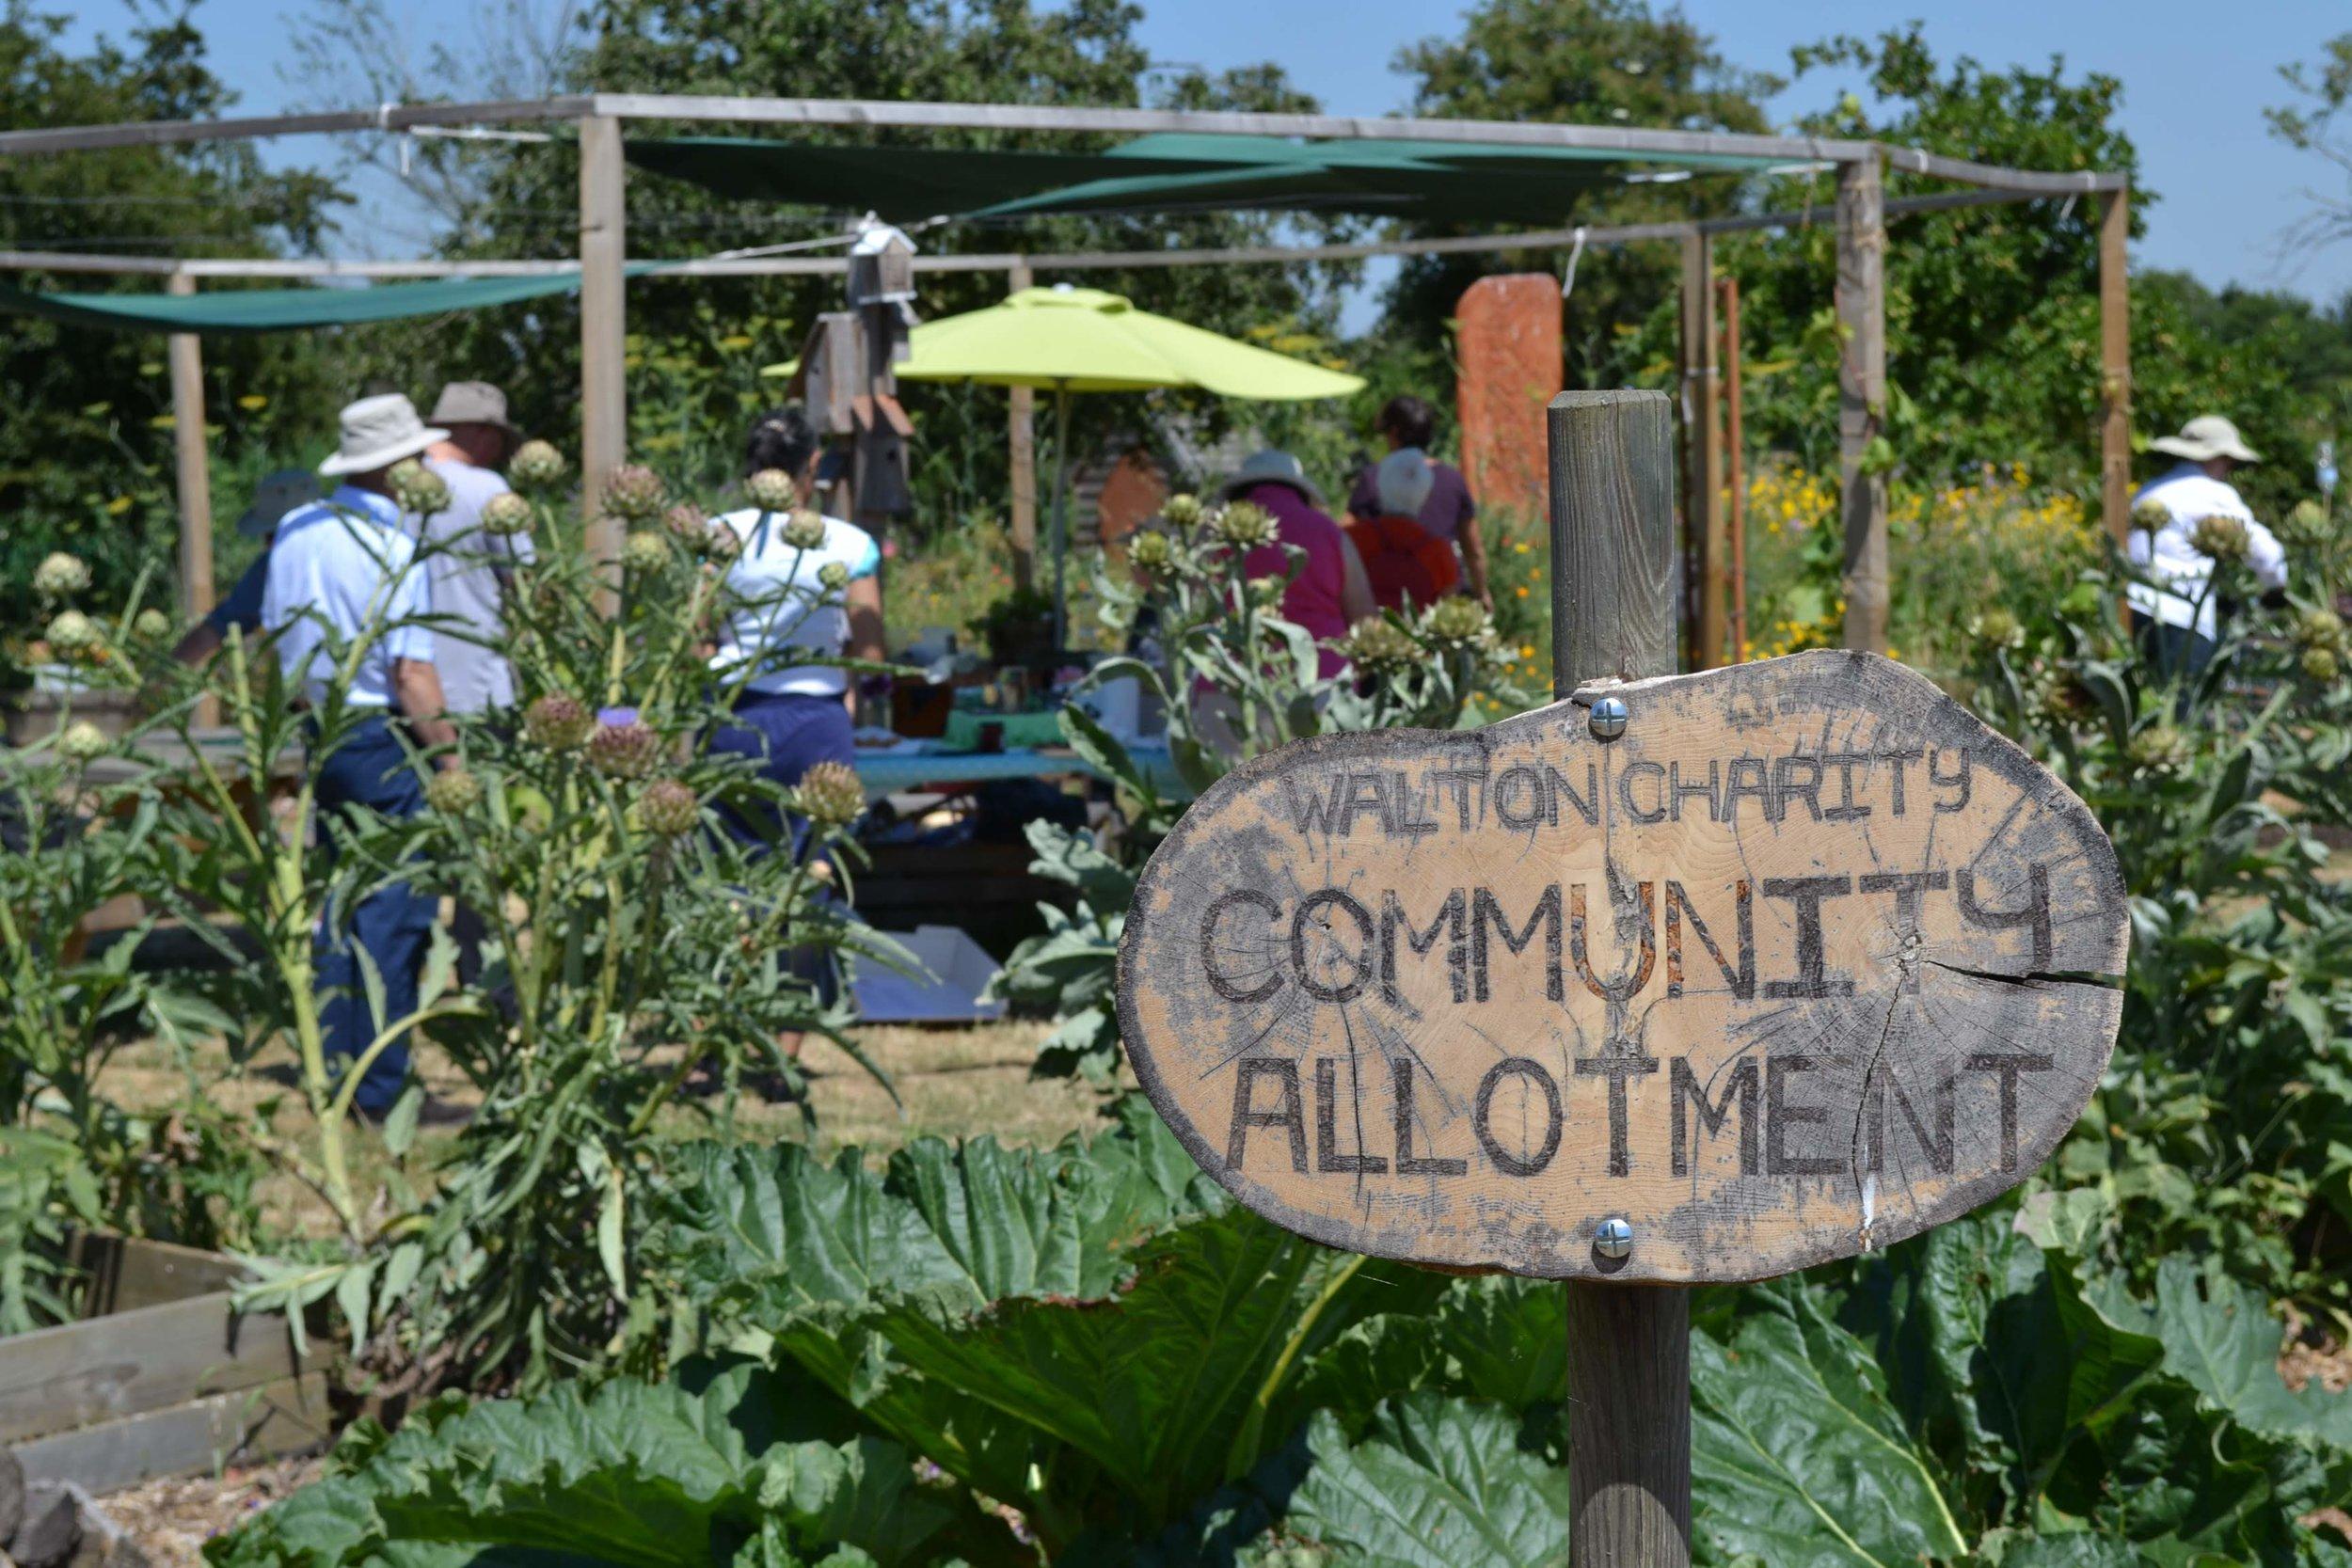 Community allotment -